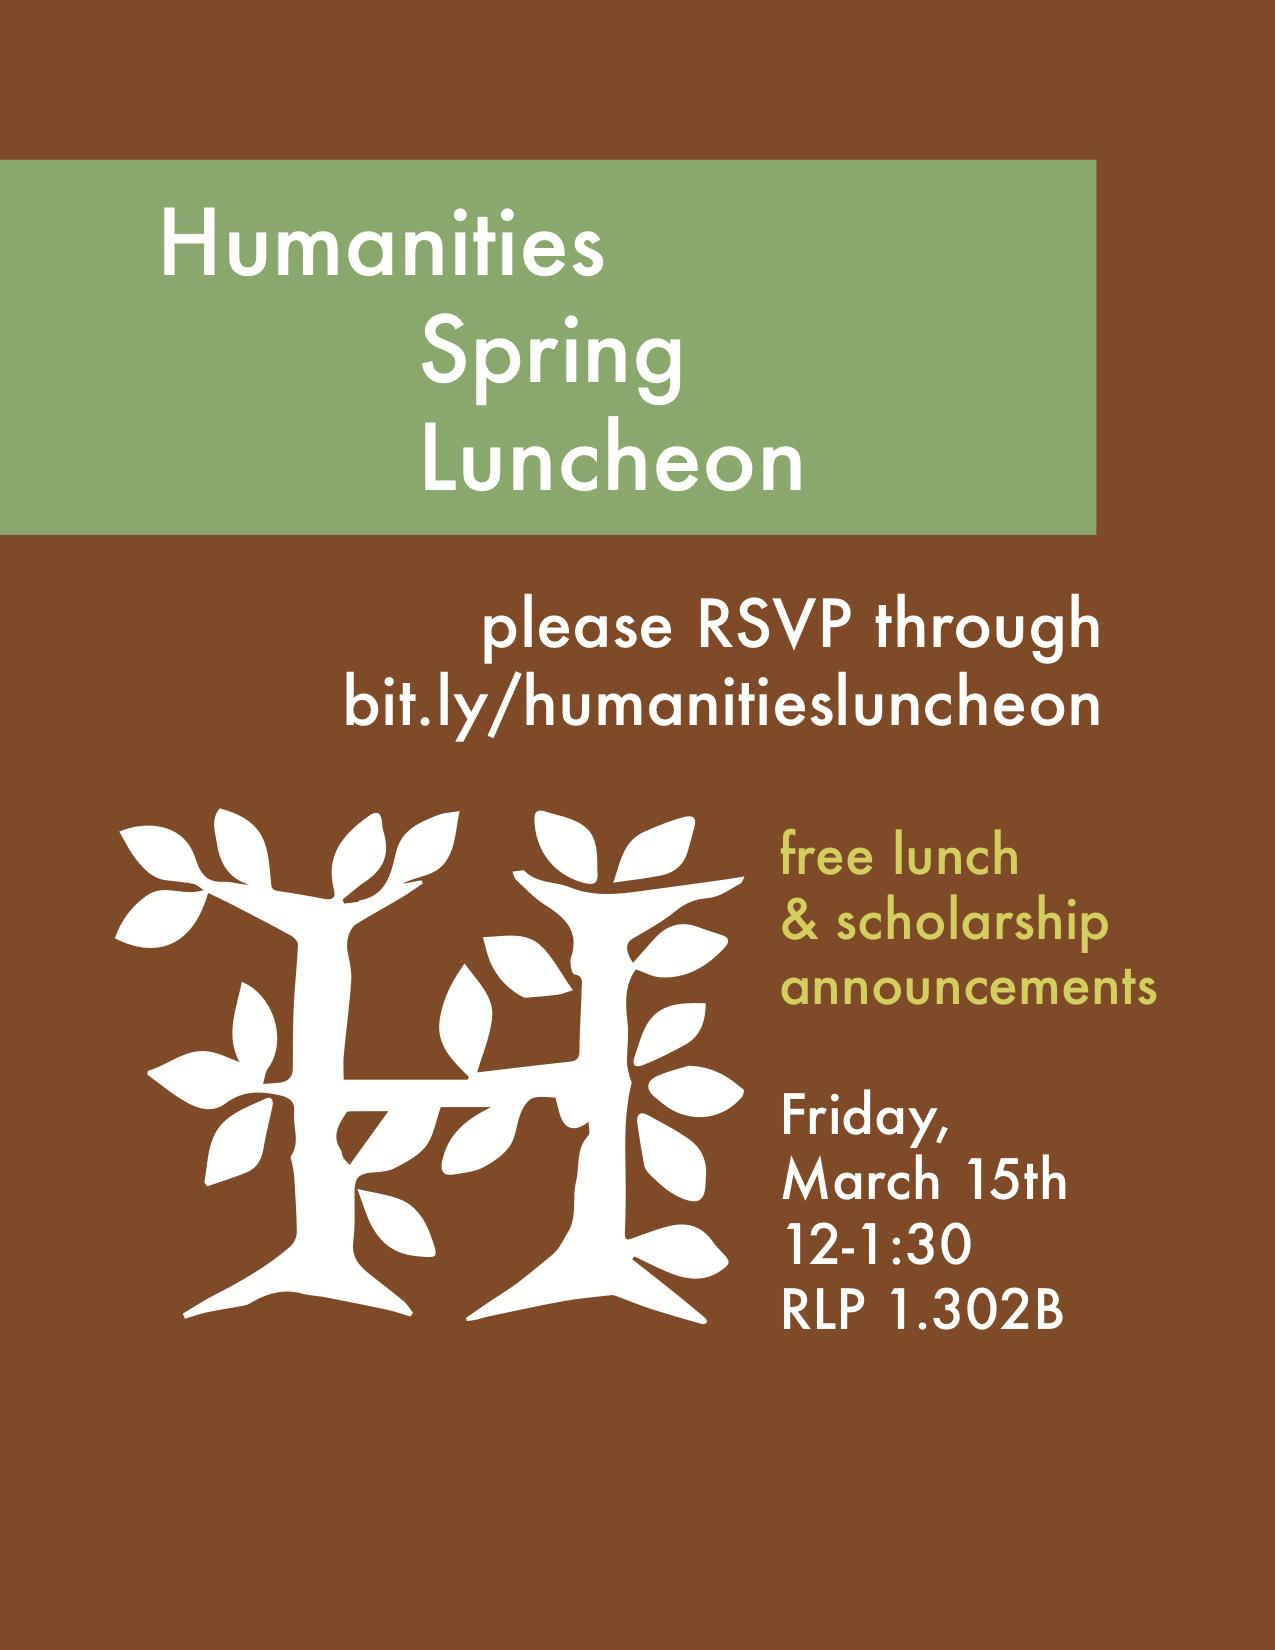 Humanities Spring Luncheon